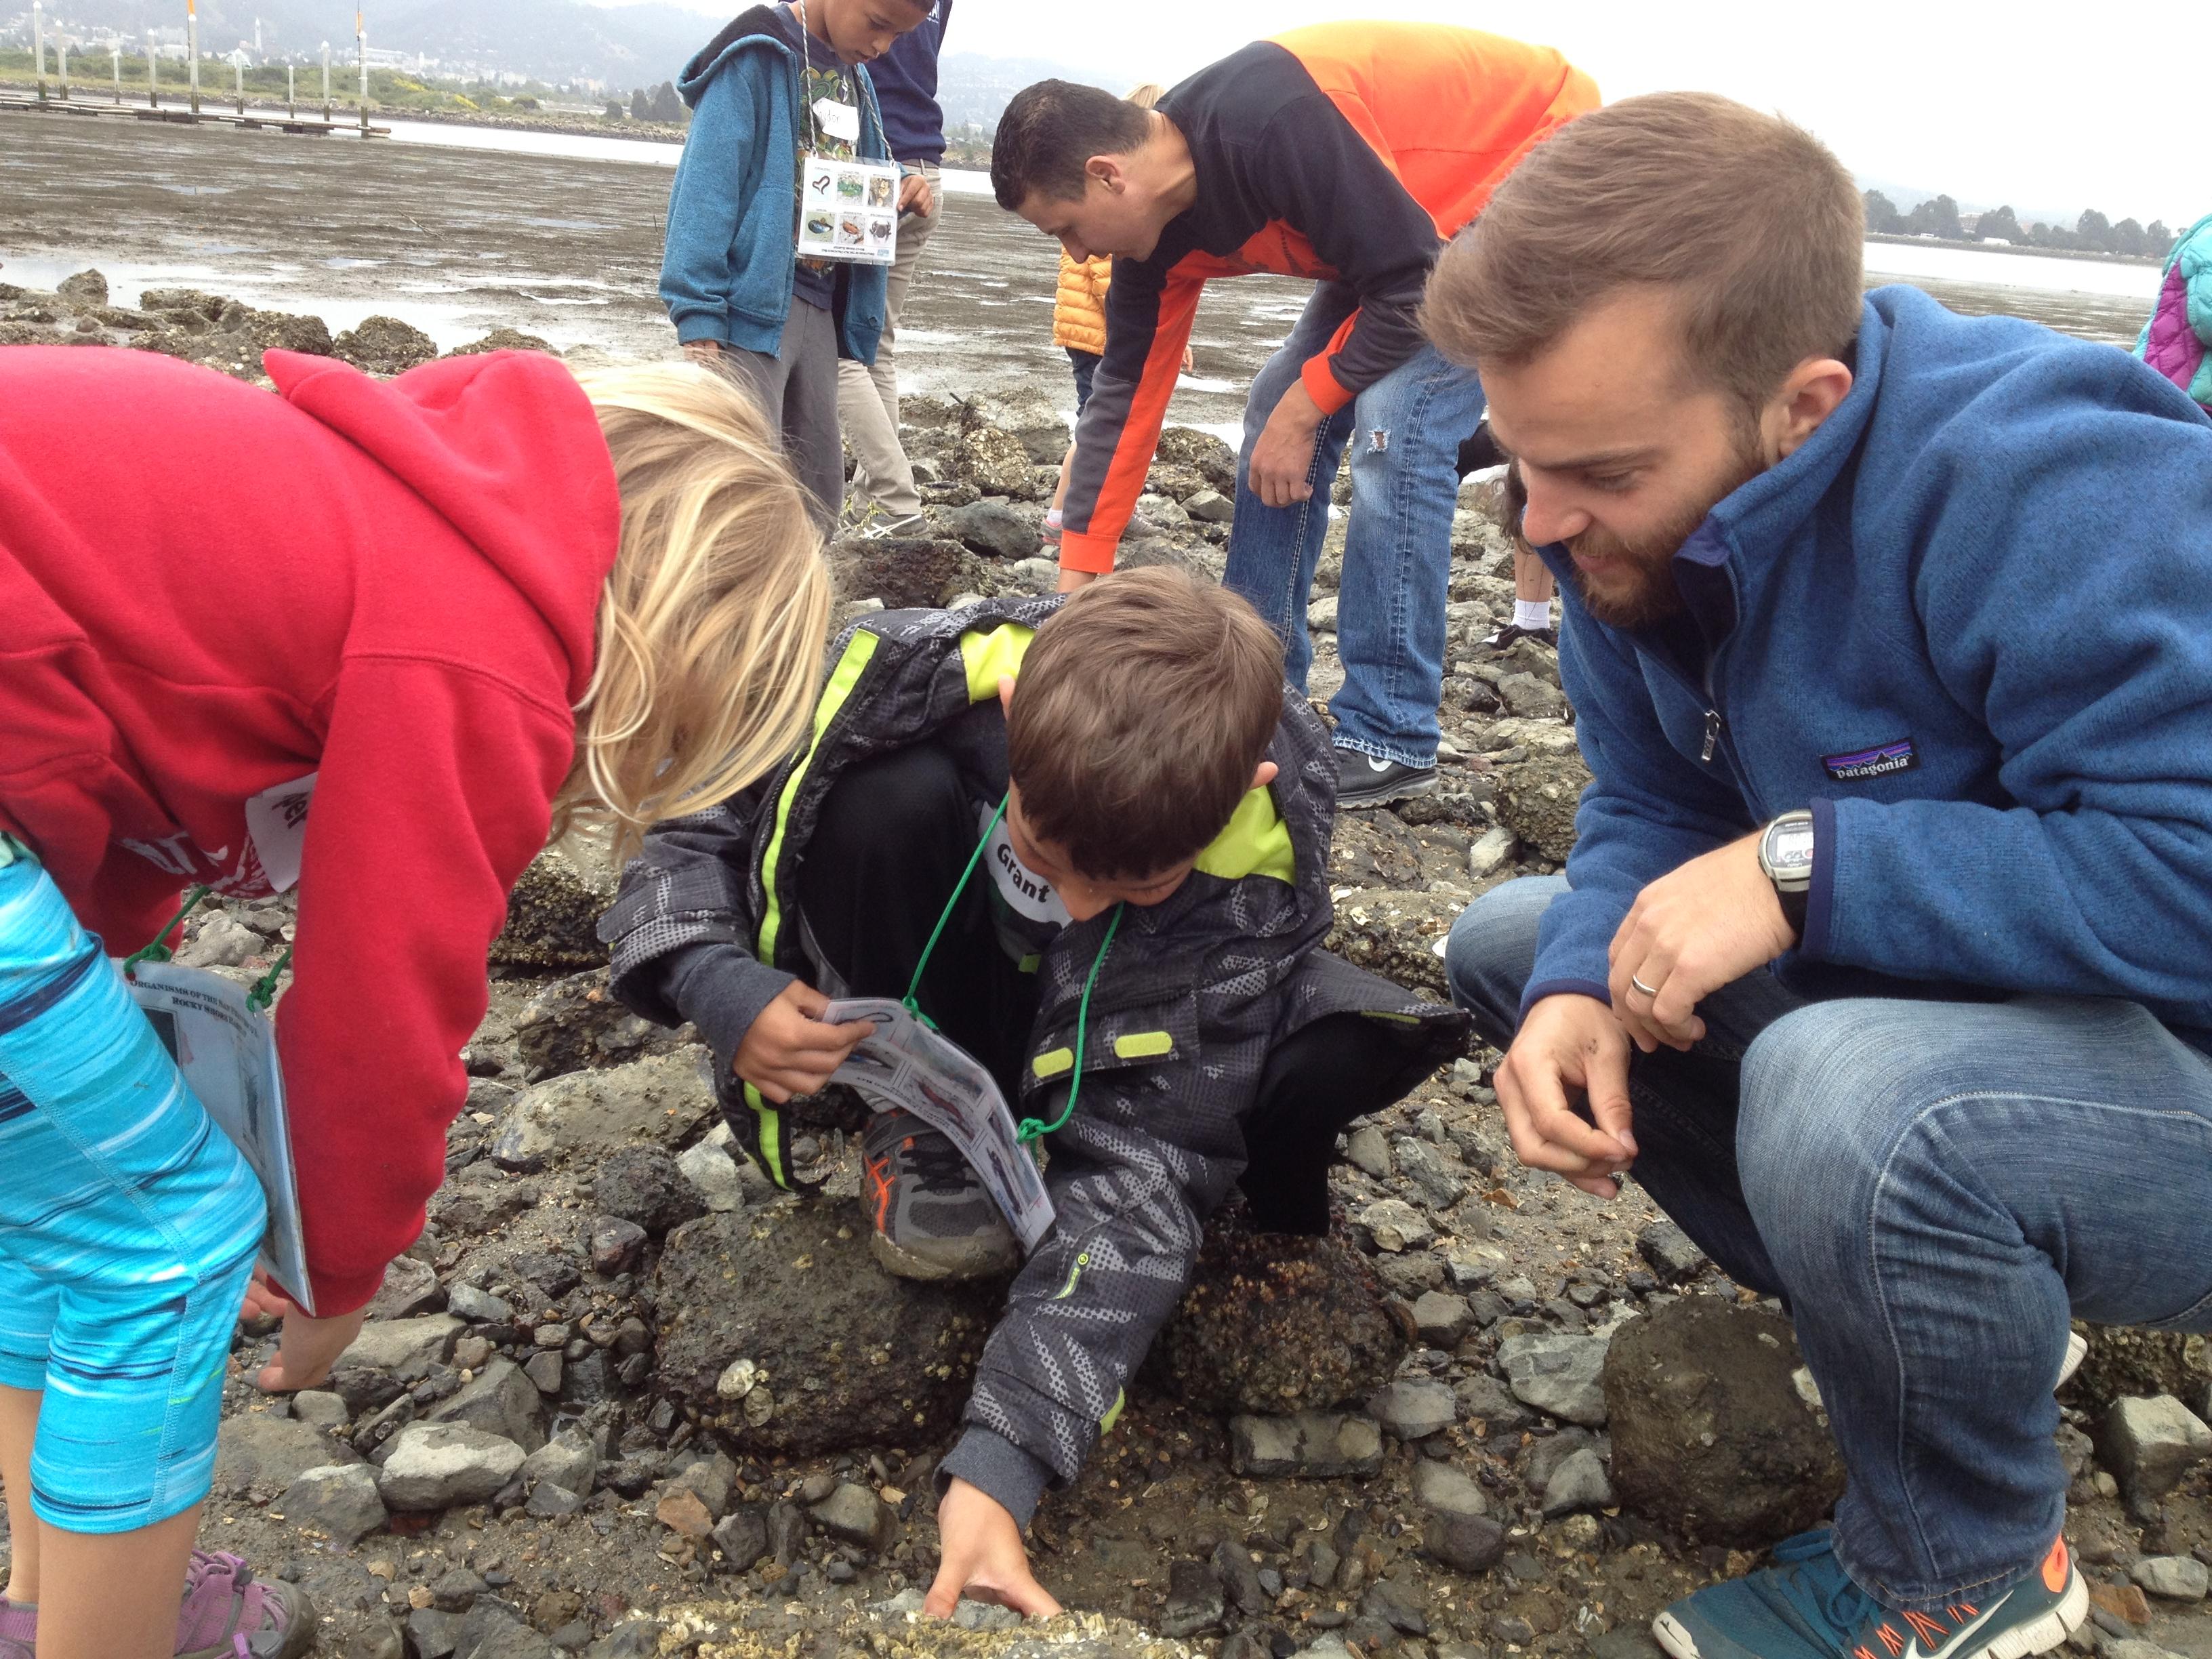 Nate Entrekin & Kids for the Bay